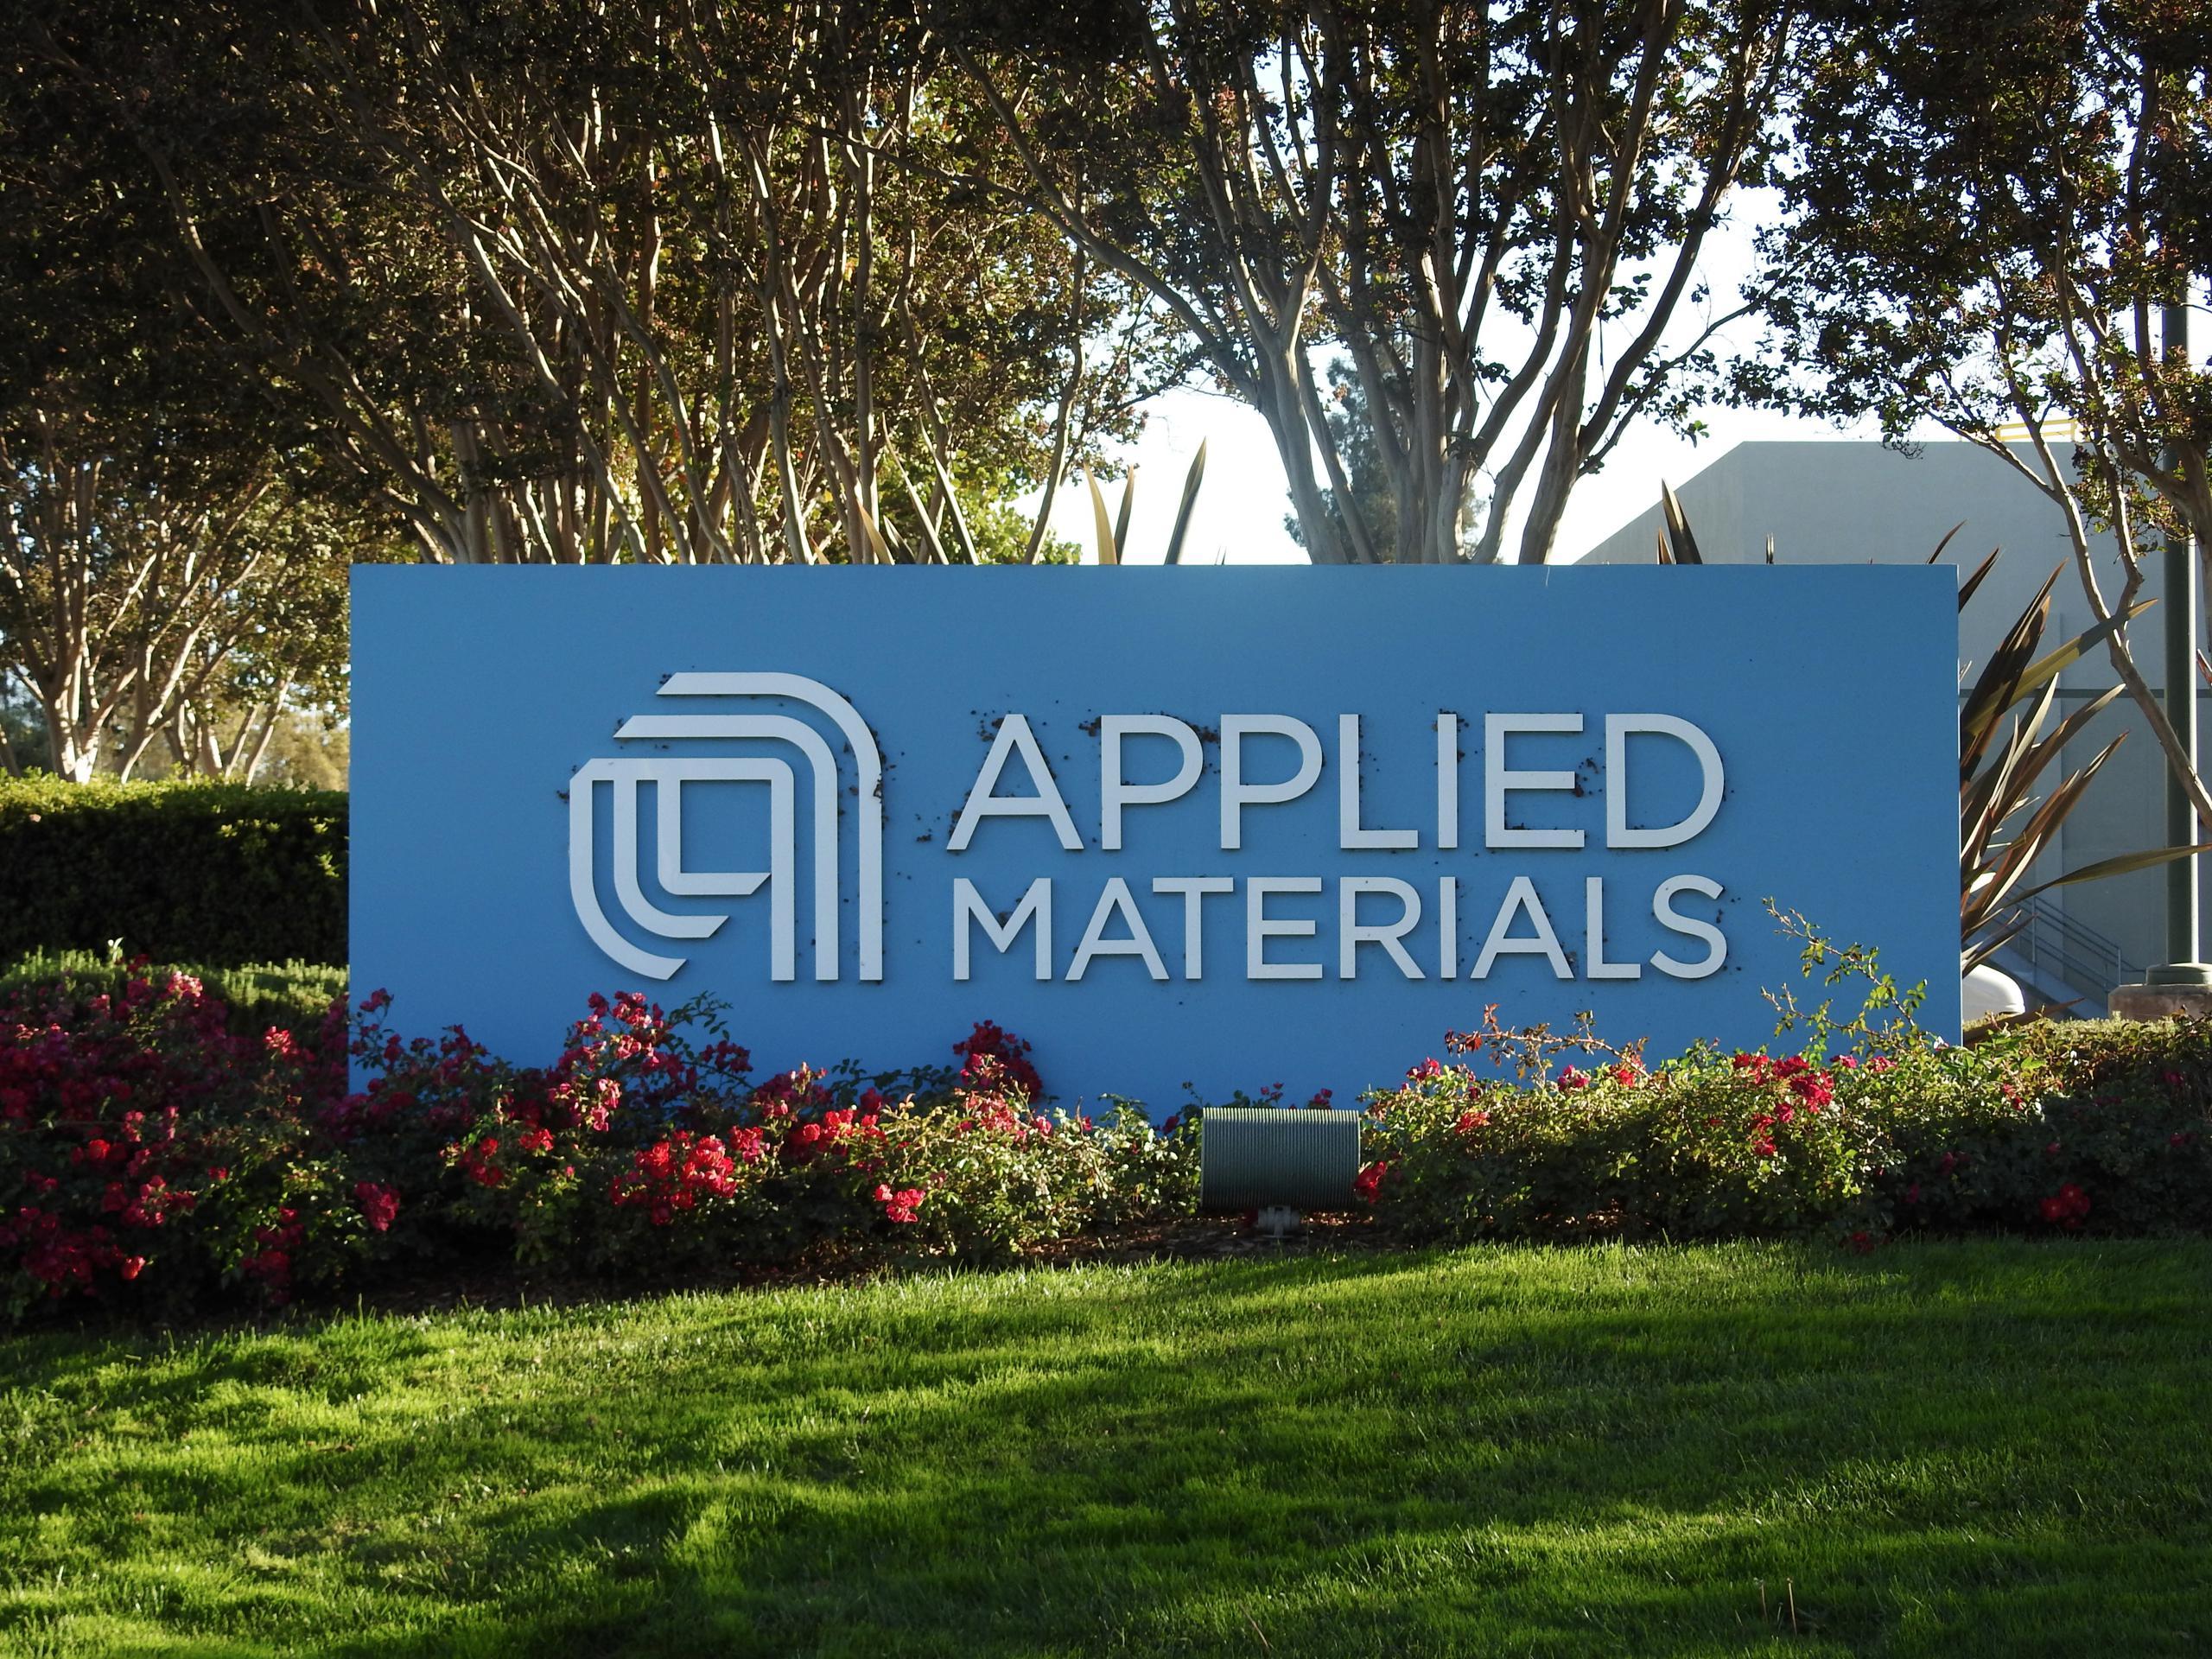 Applied Materials' corporate headquarters in Santa Clara, California.